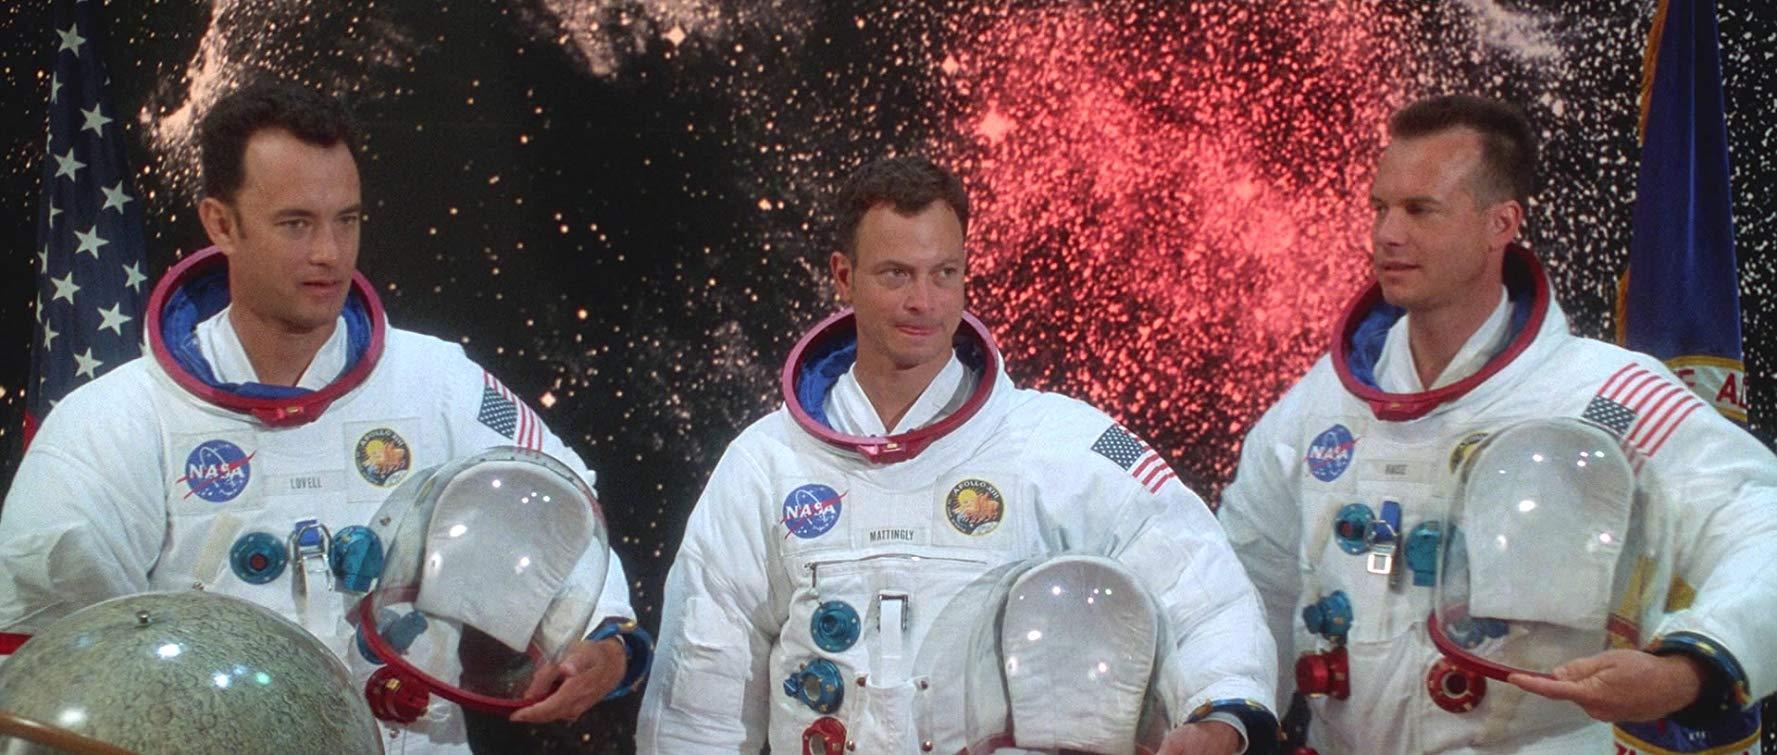 Tom Hanks, Gary Sinise y Bill Paxton en 'Apolo XIII' de Ron Howard (1995)